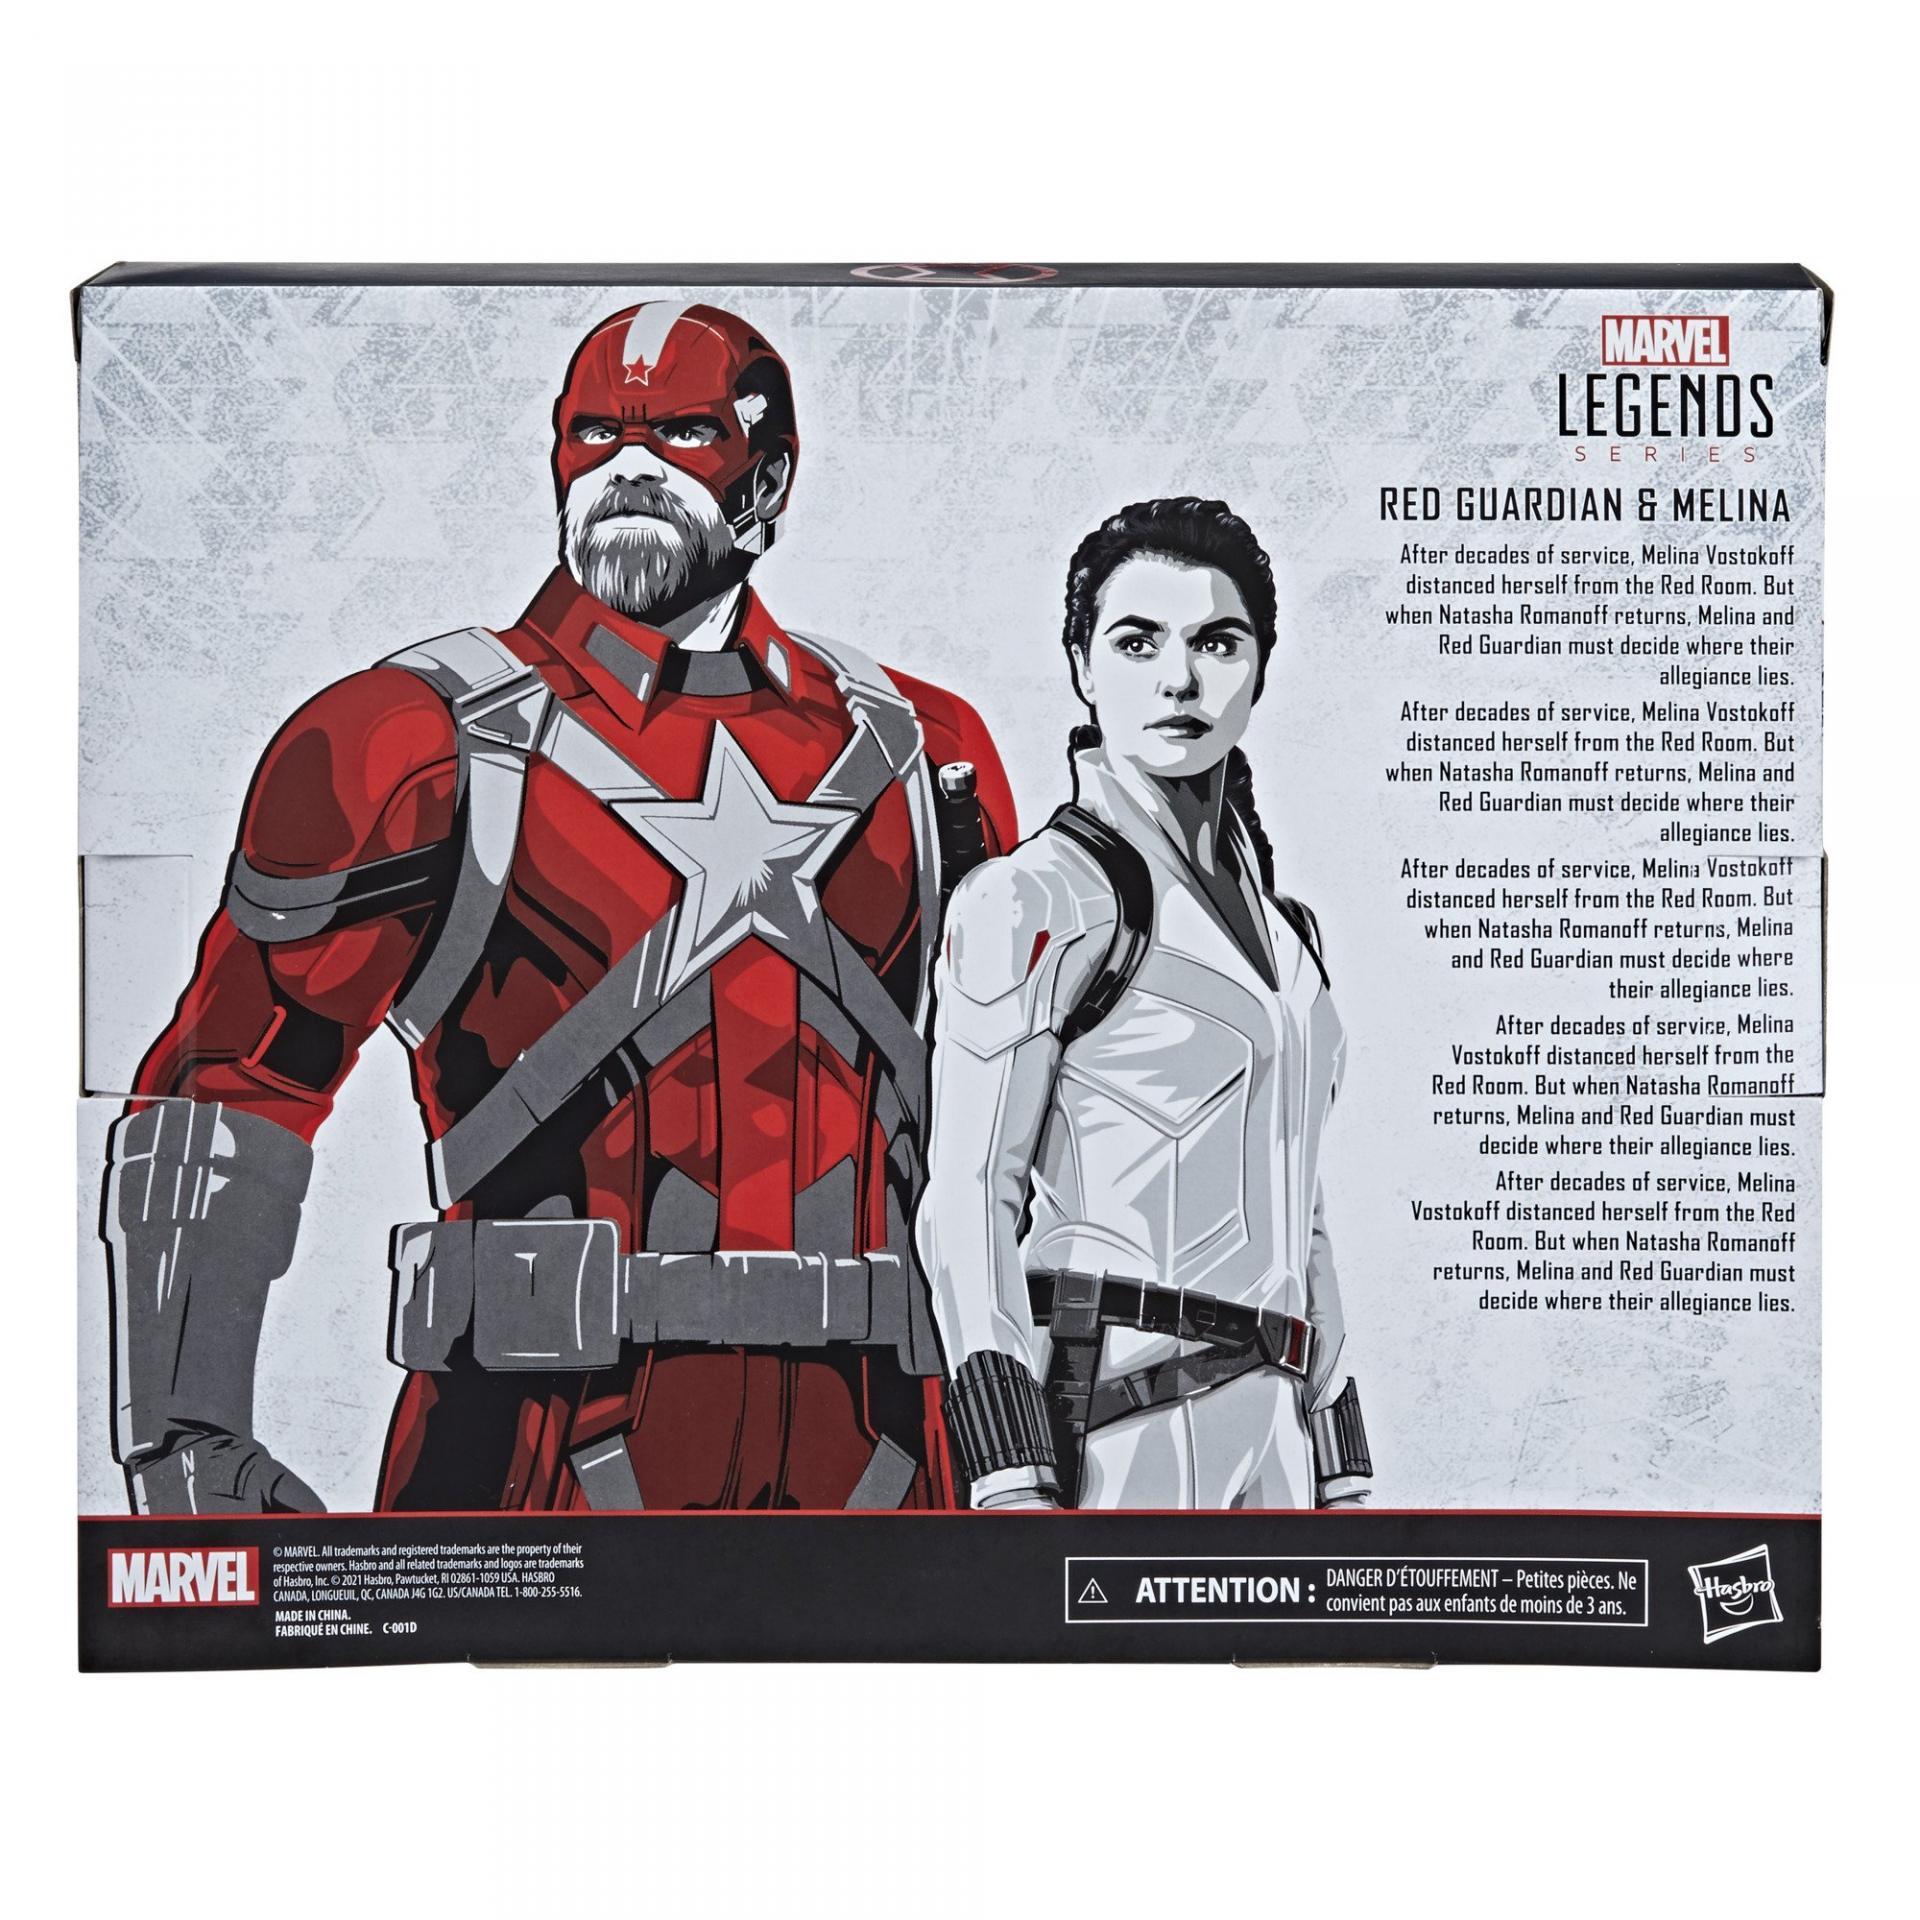 Marvel legends series hasbro red guardian melina vostkoff 2 pack11